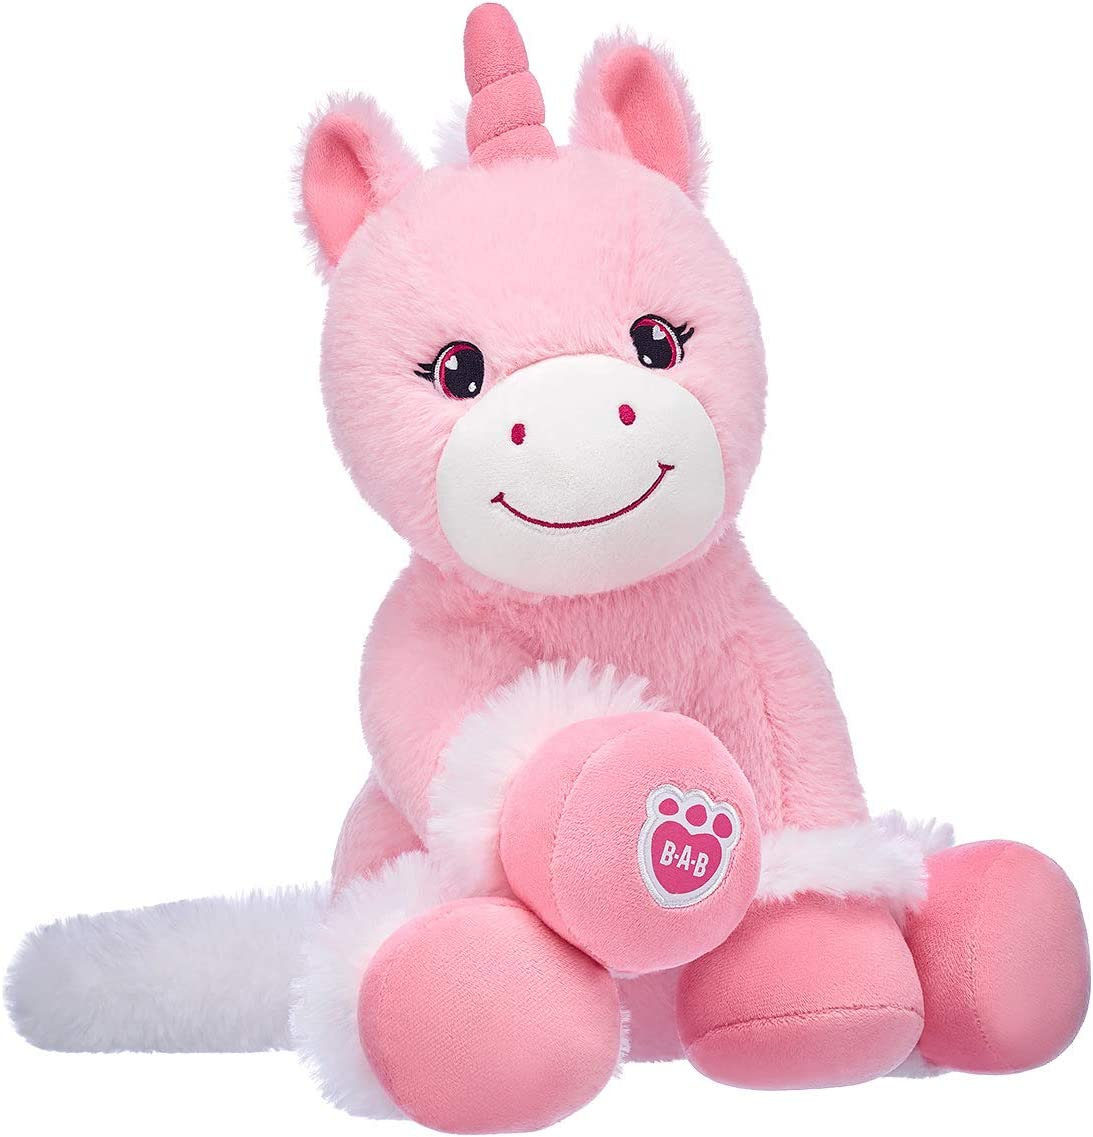 Build A Bear Workshop Amazon Exclusive Pink Baby Unicorn